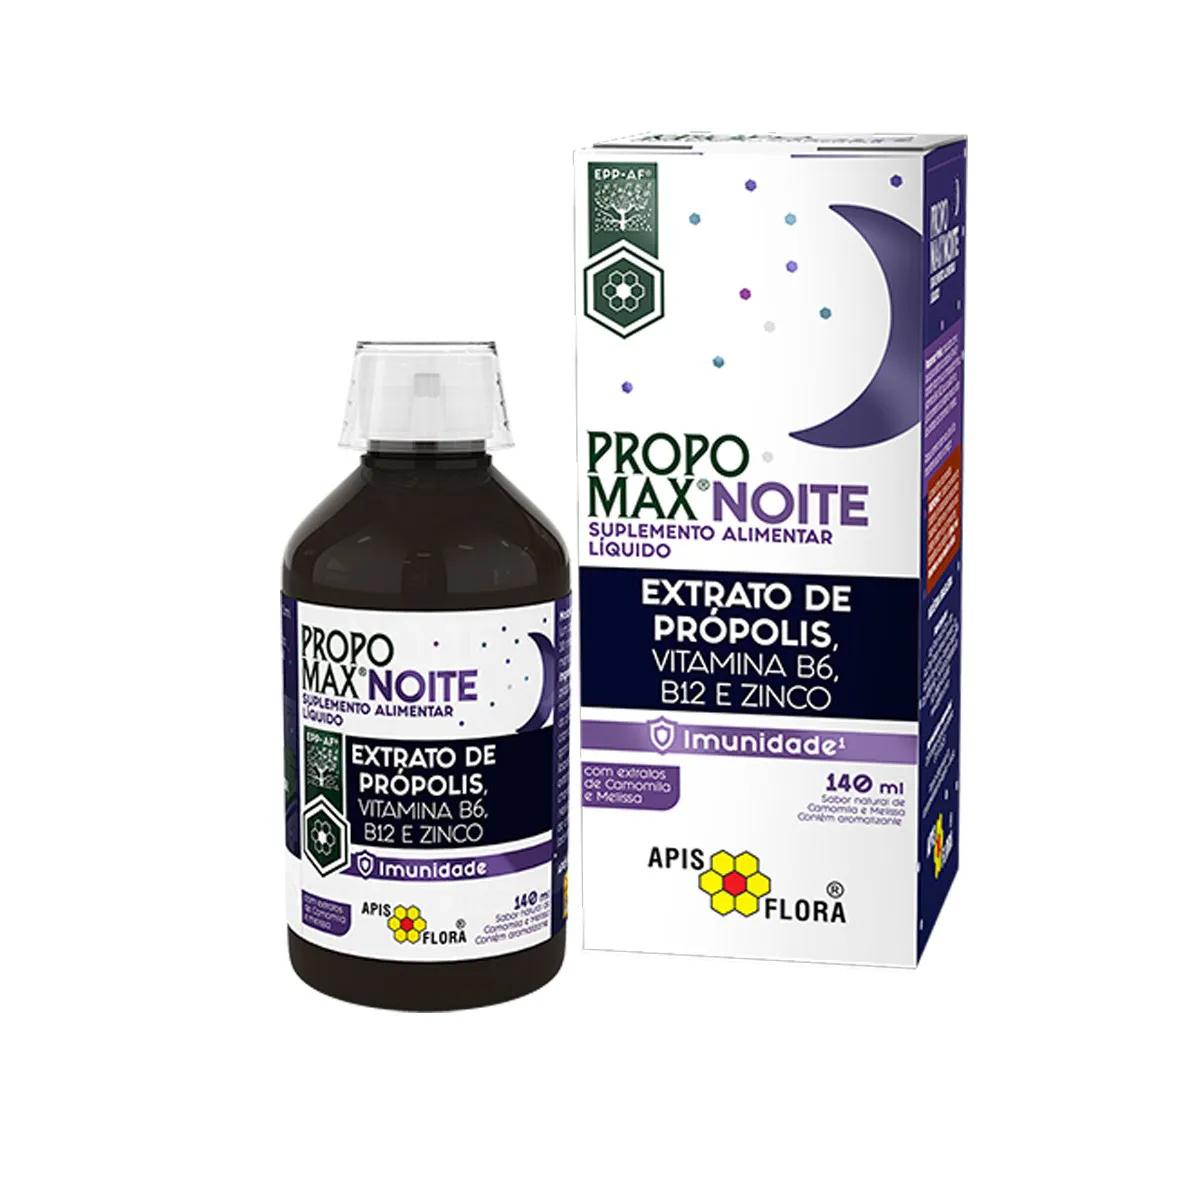 Extrato de Própolis Propomax Noite 140ml - Apis Flora